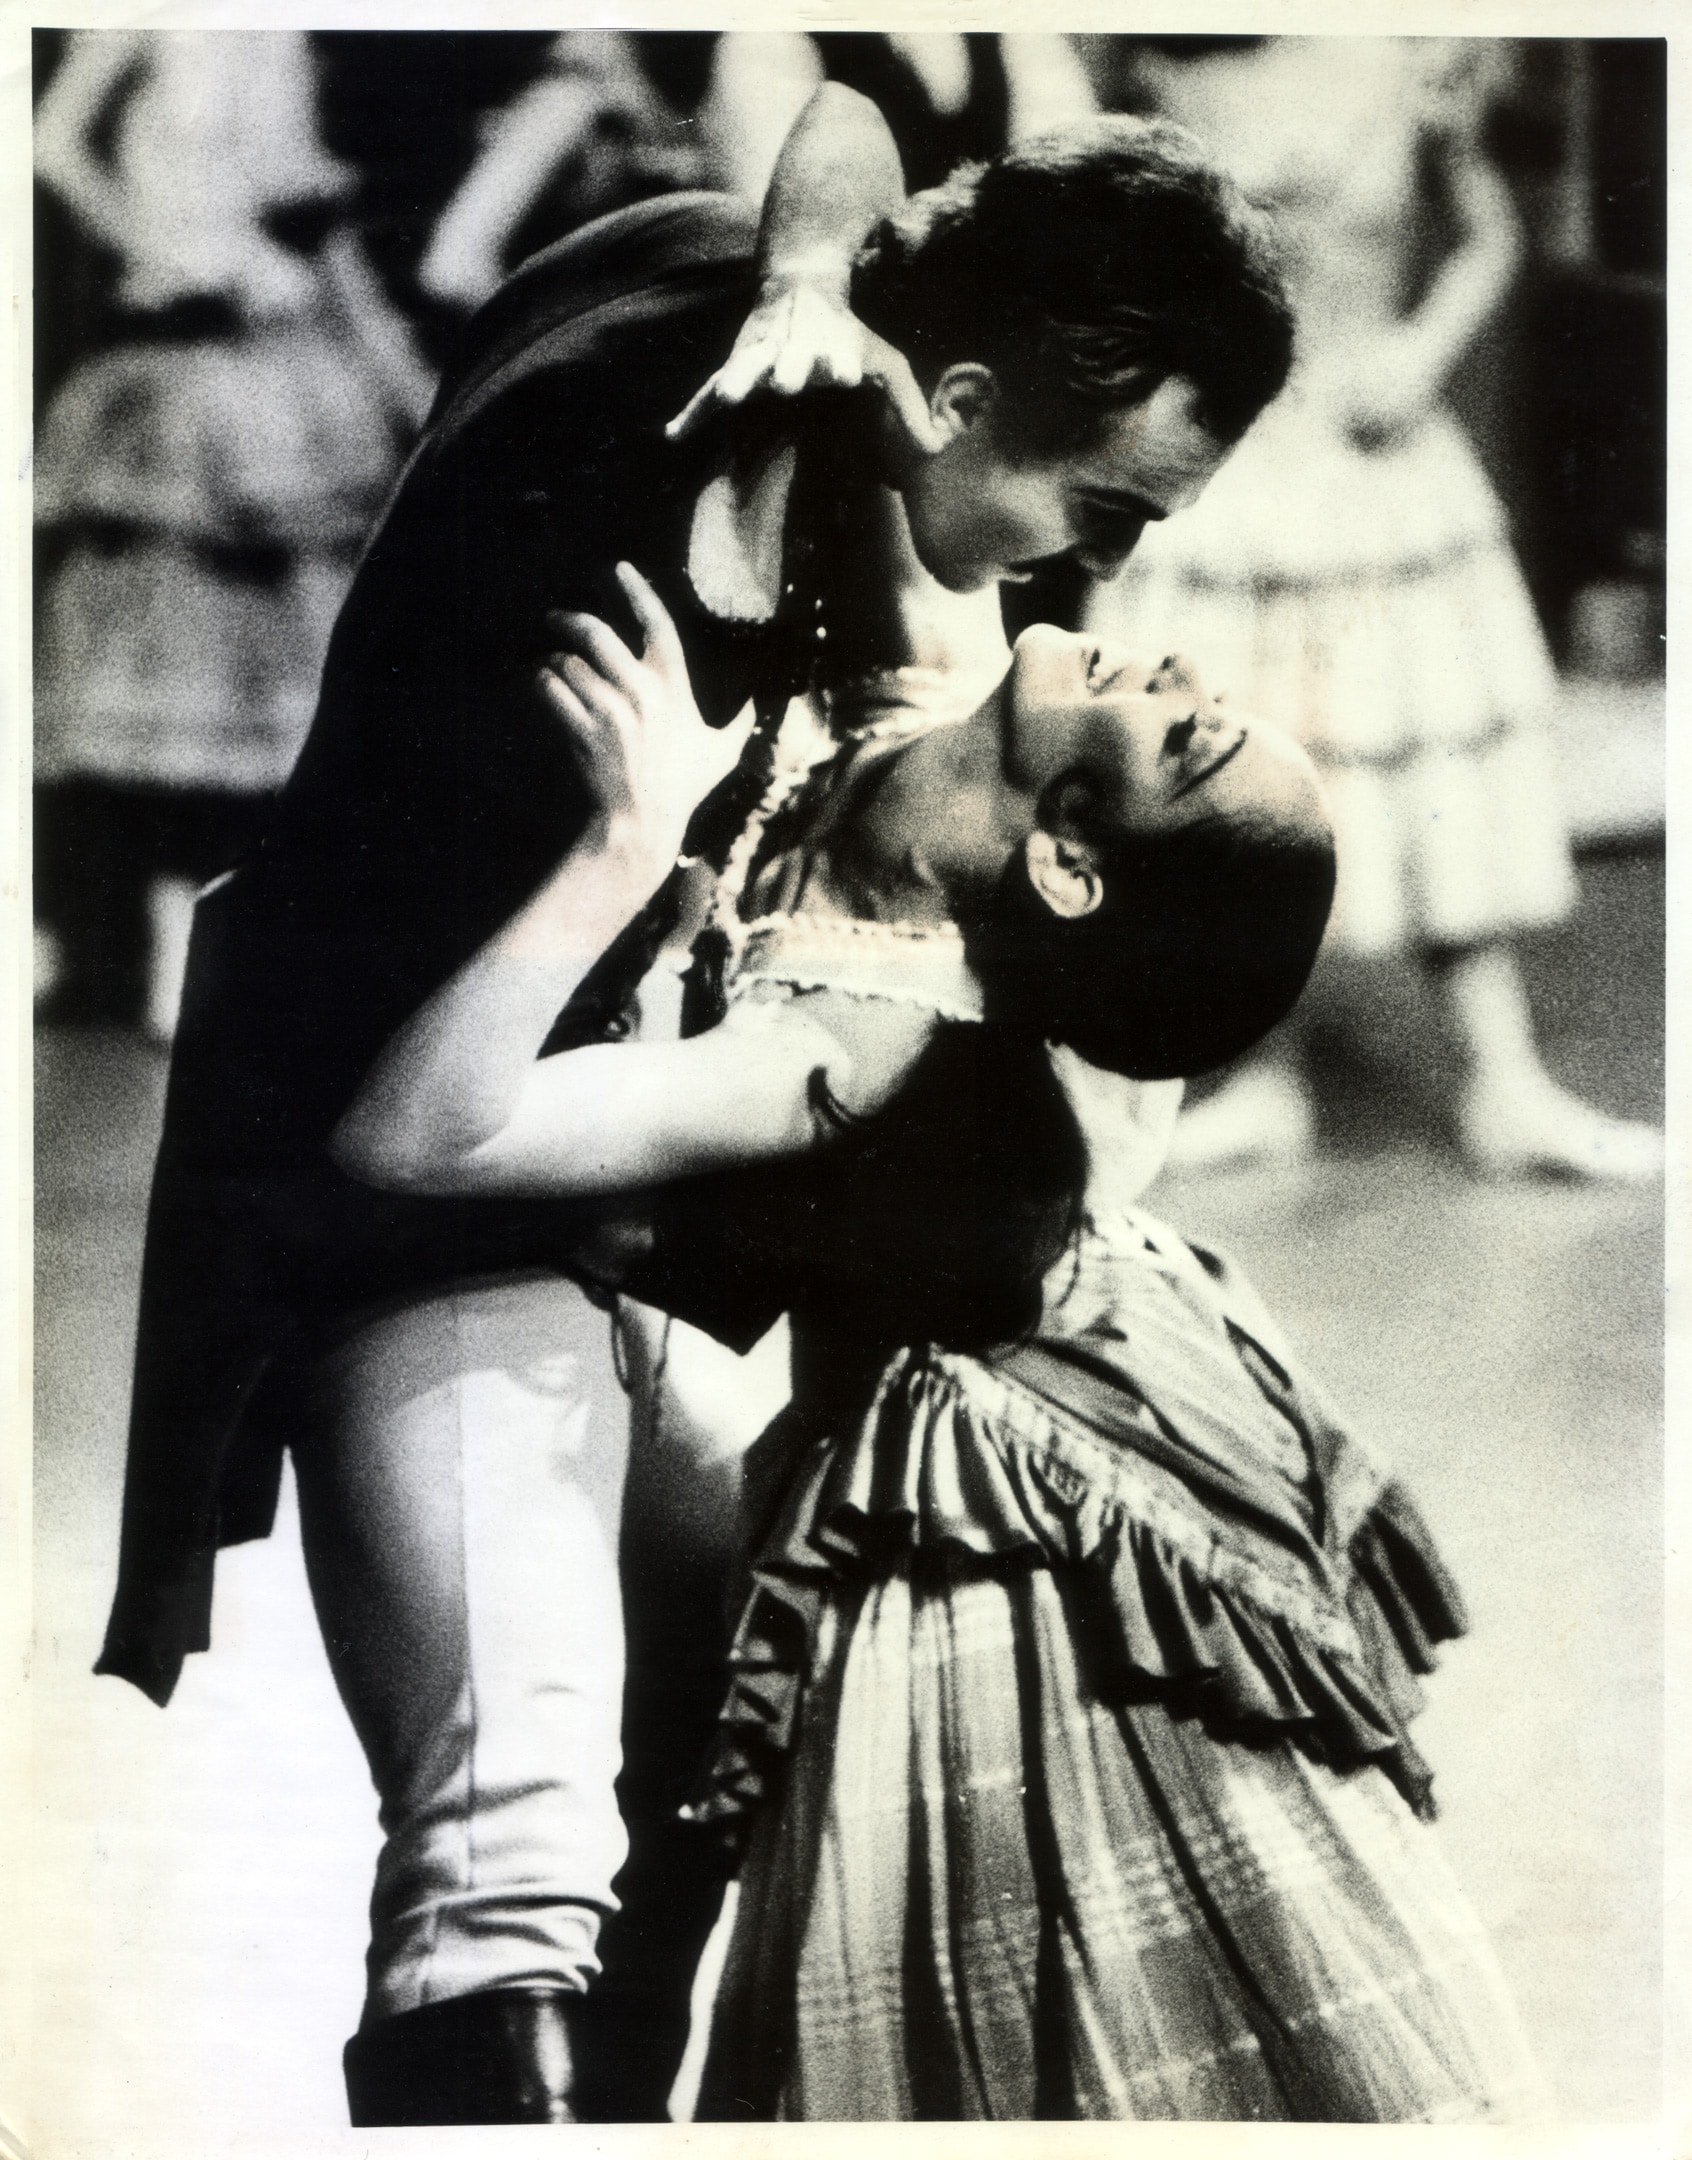 Rosetta Cook: Carmen - with Dale Johnston, 1981